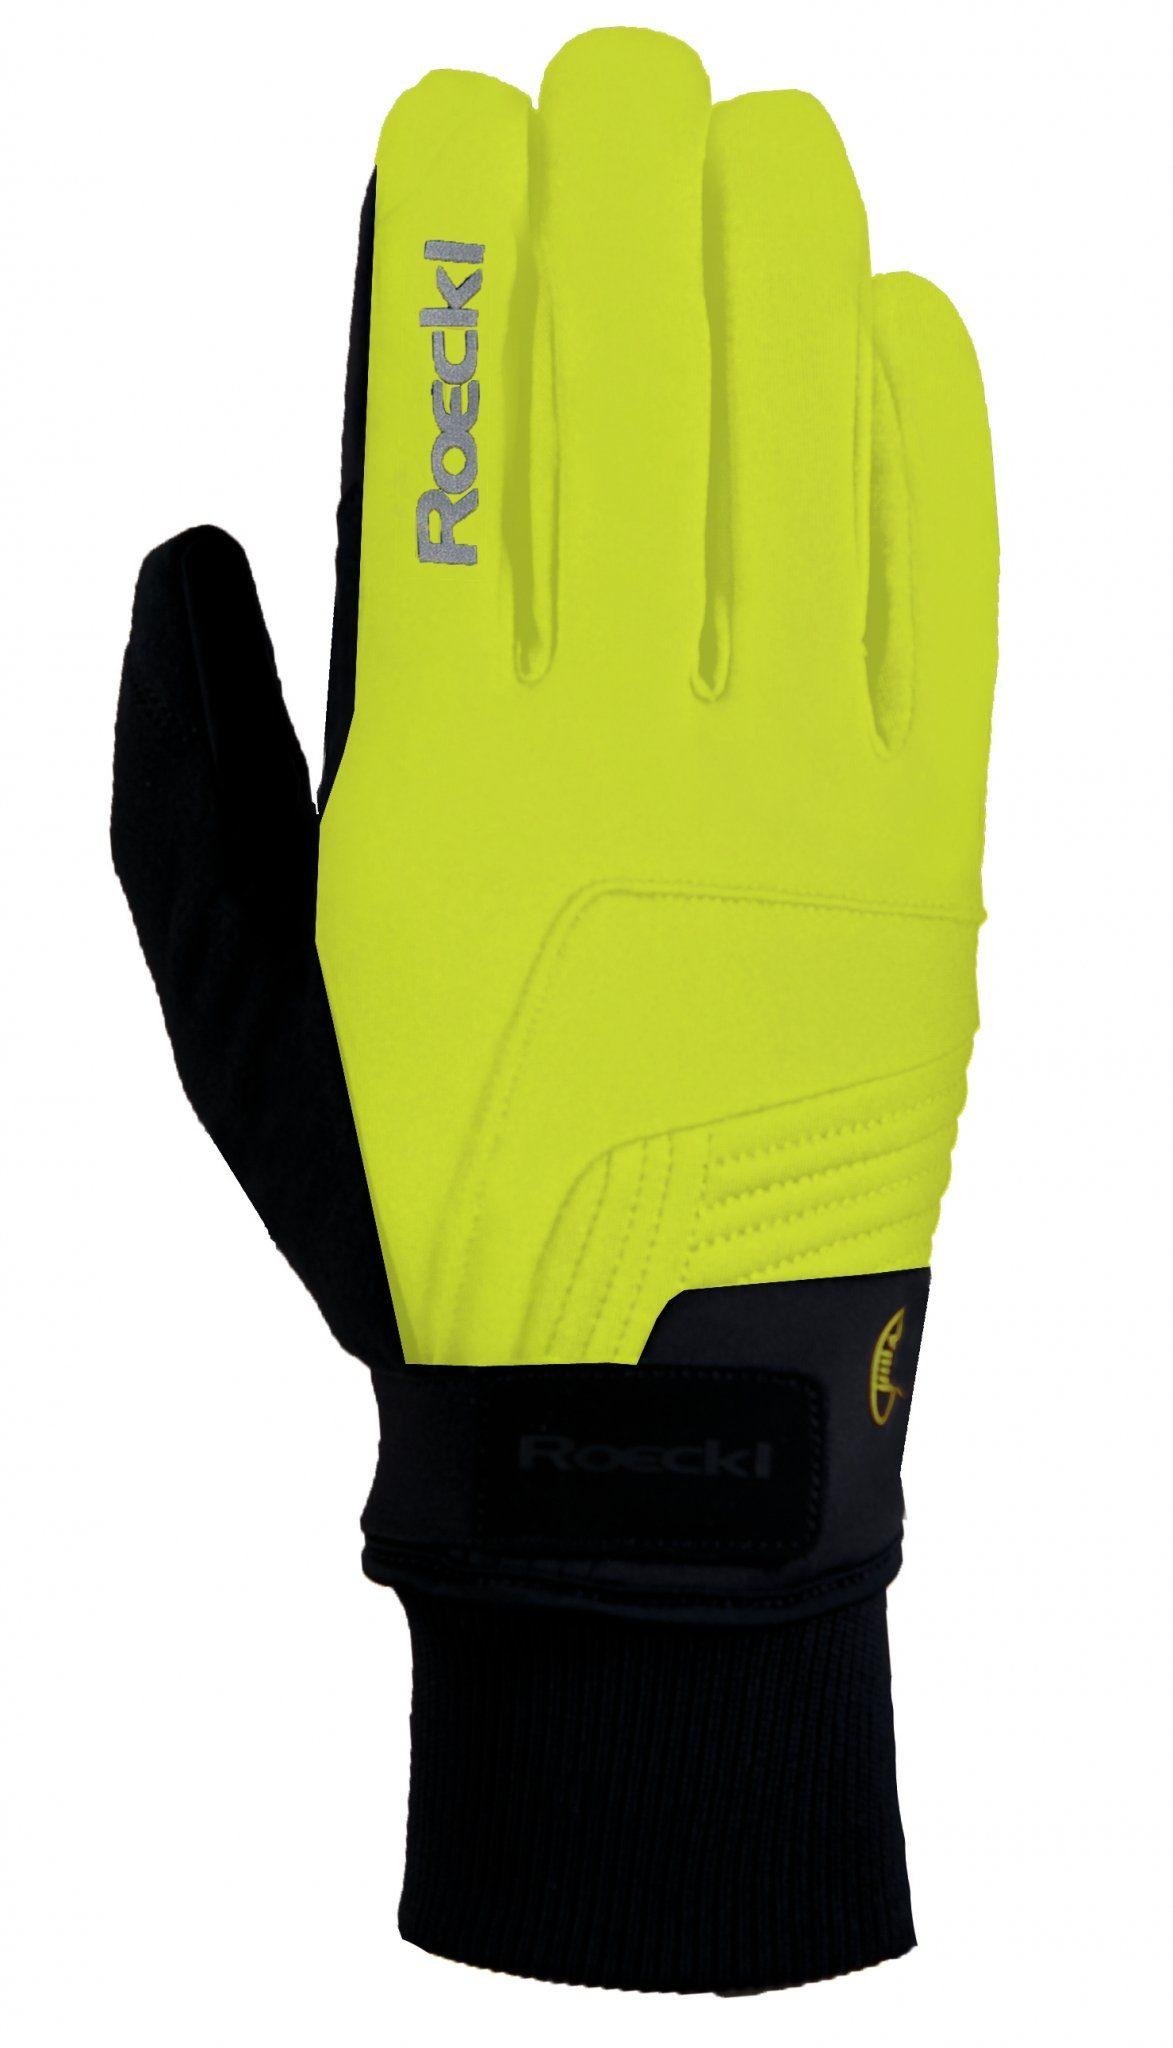 Roeckl Fahrrad Handschuhe »Rebelva Handschuhe«